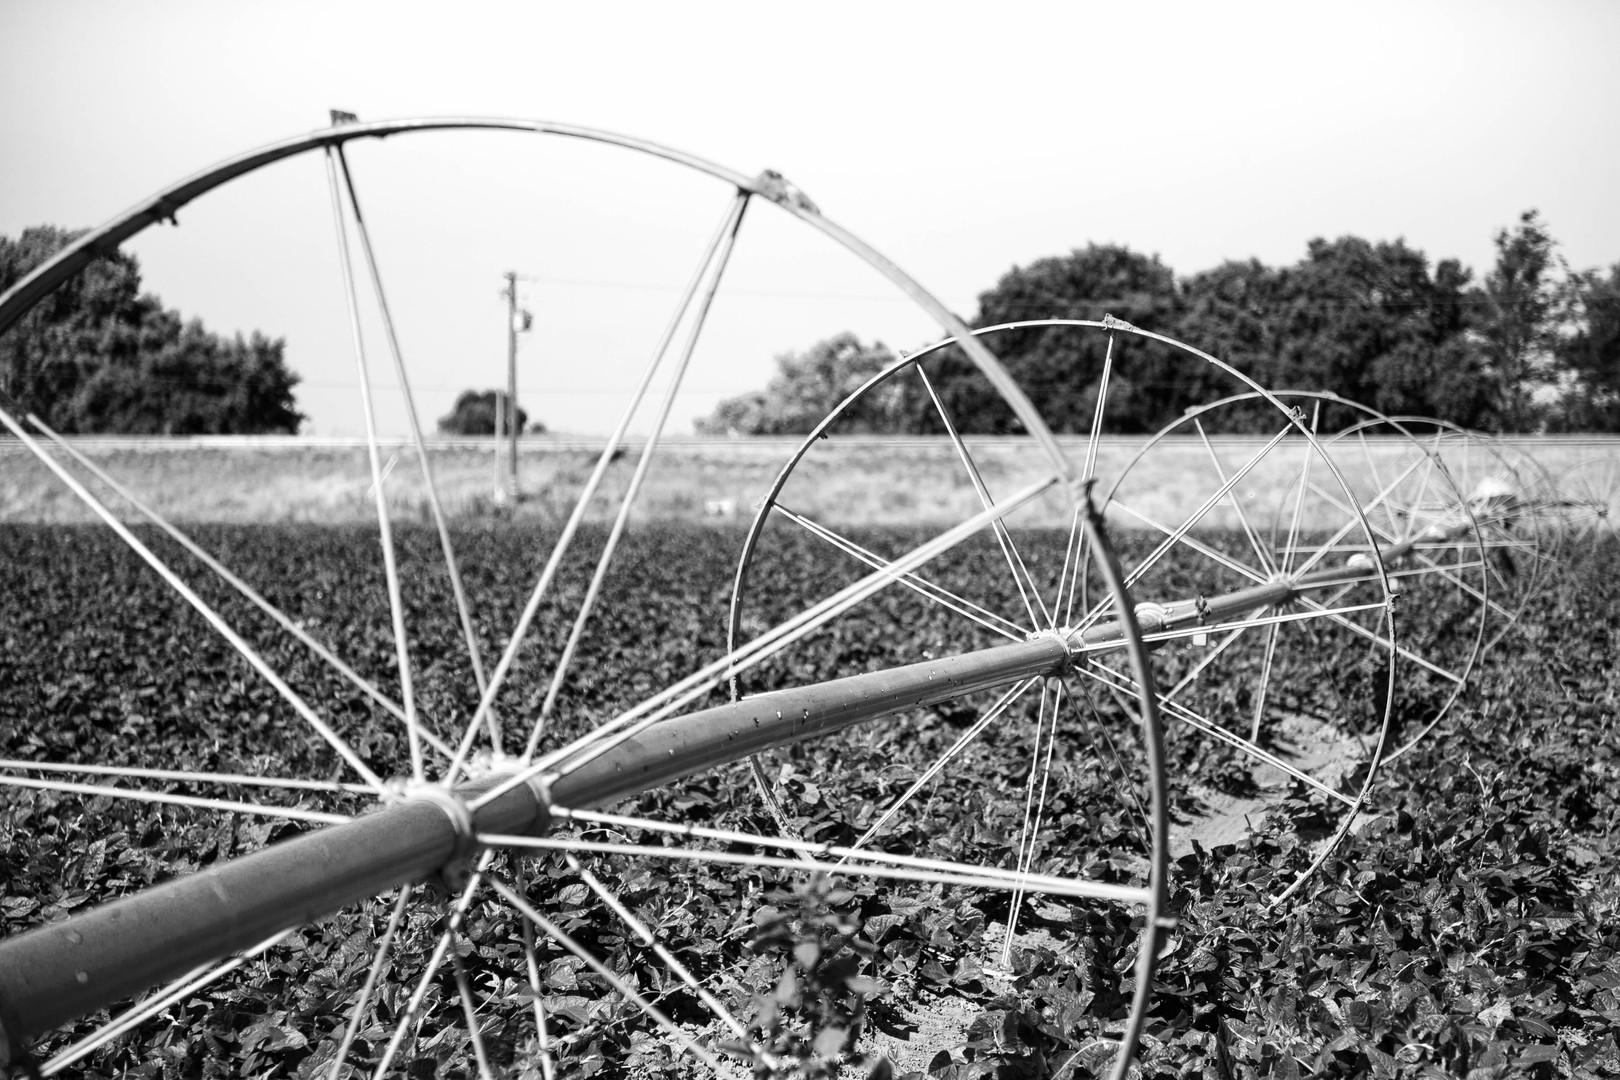 An Irrigation Wheel in the Field